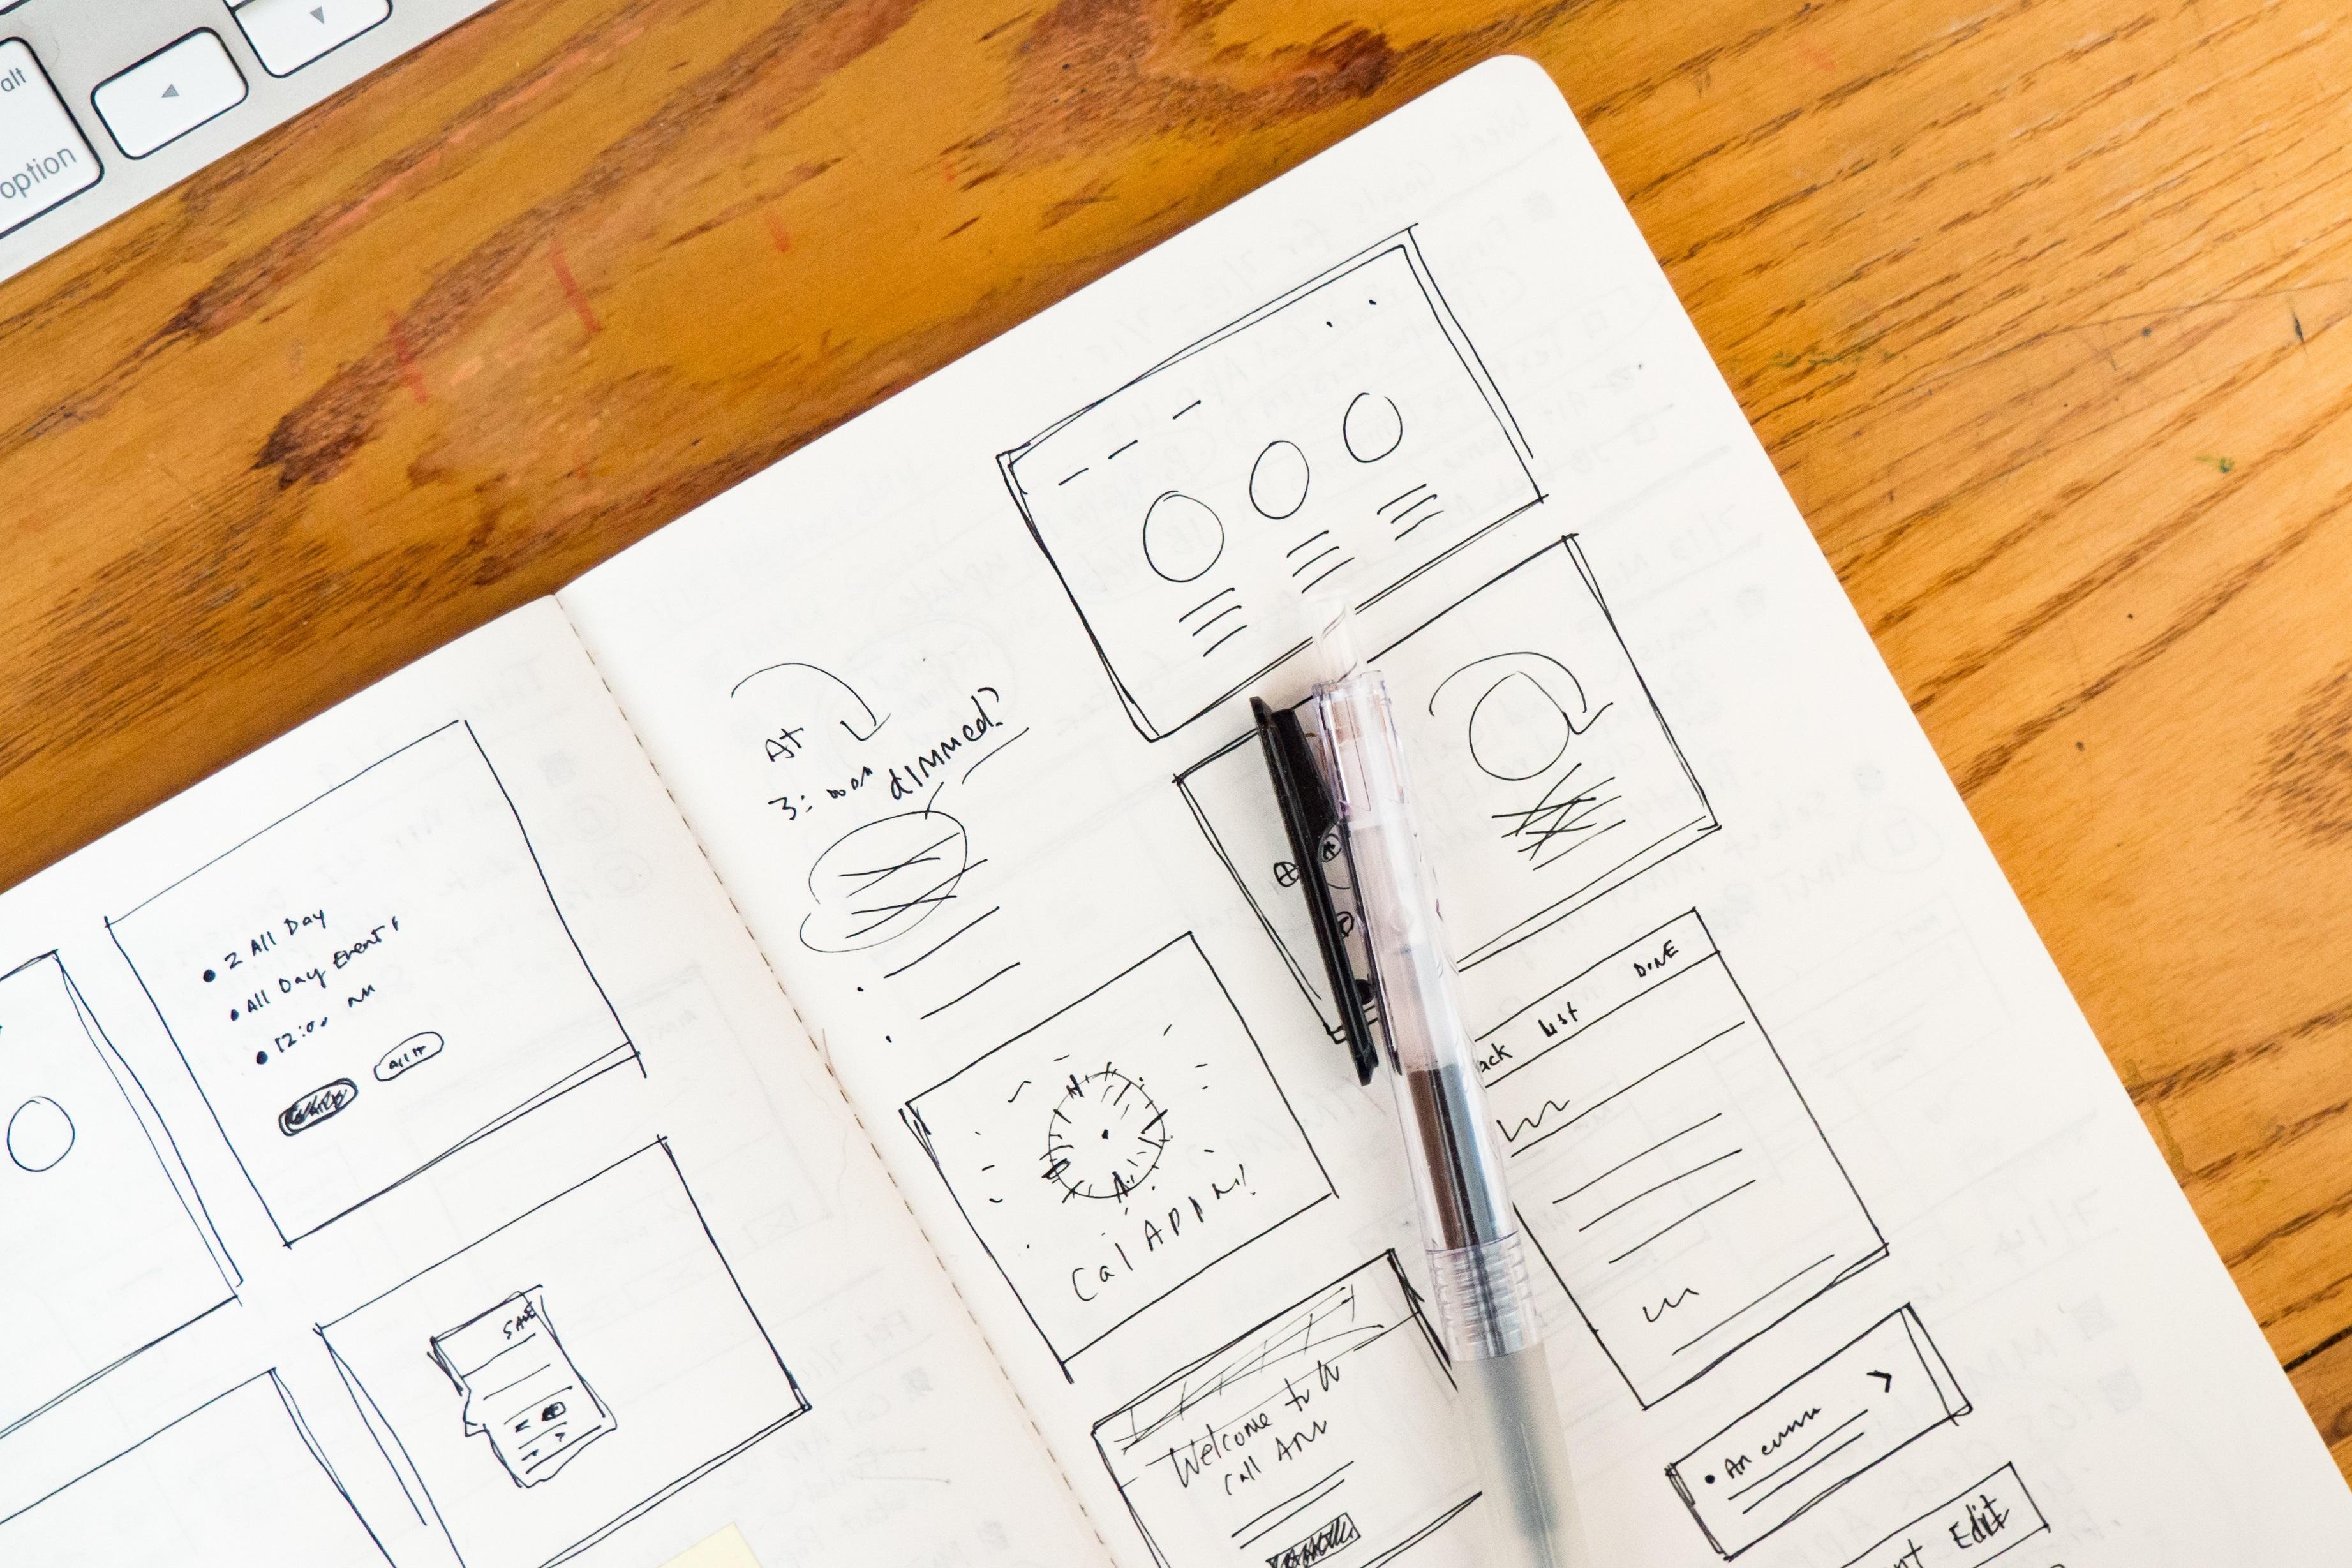 Presentation design draft using bullet points